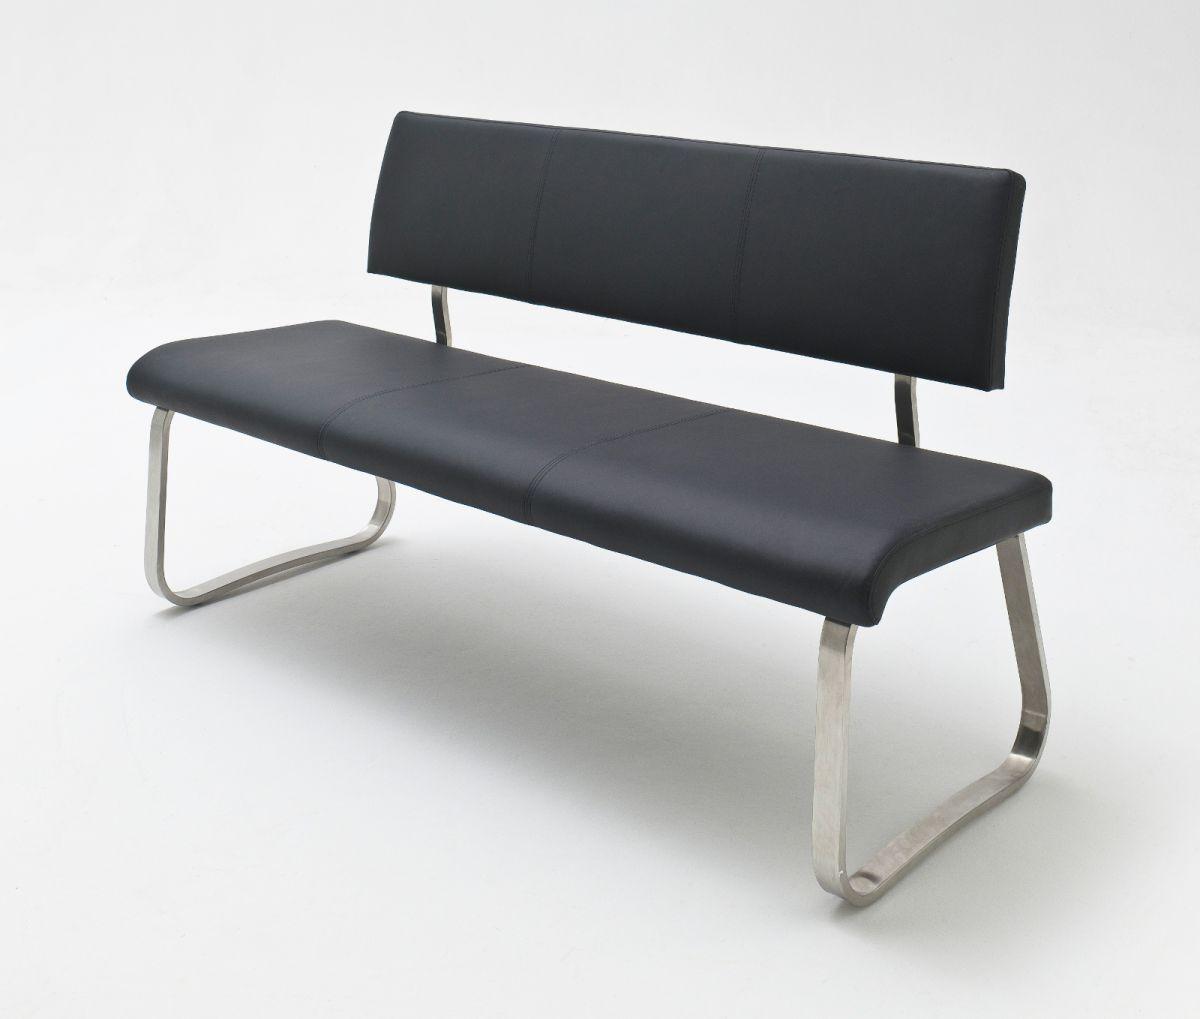 Sitzbank Arco Schwarz Kunstleder 155 cm